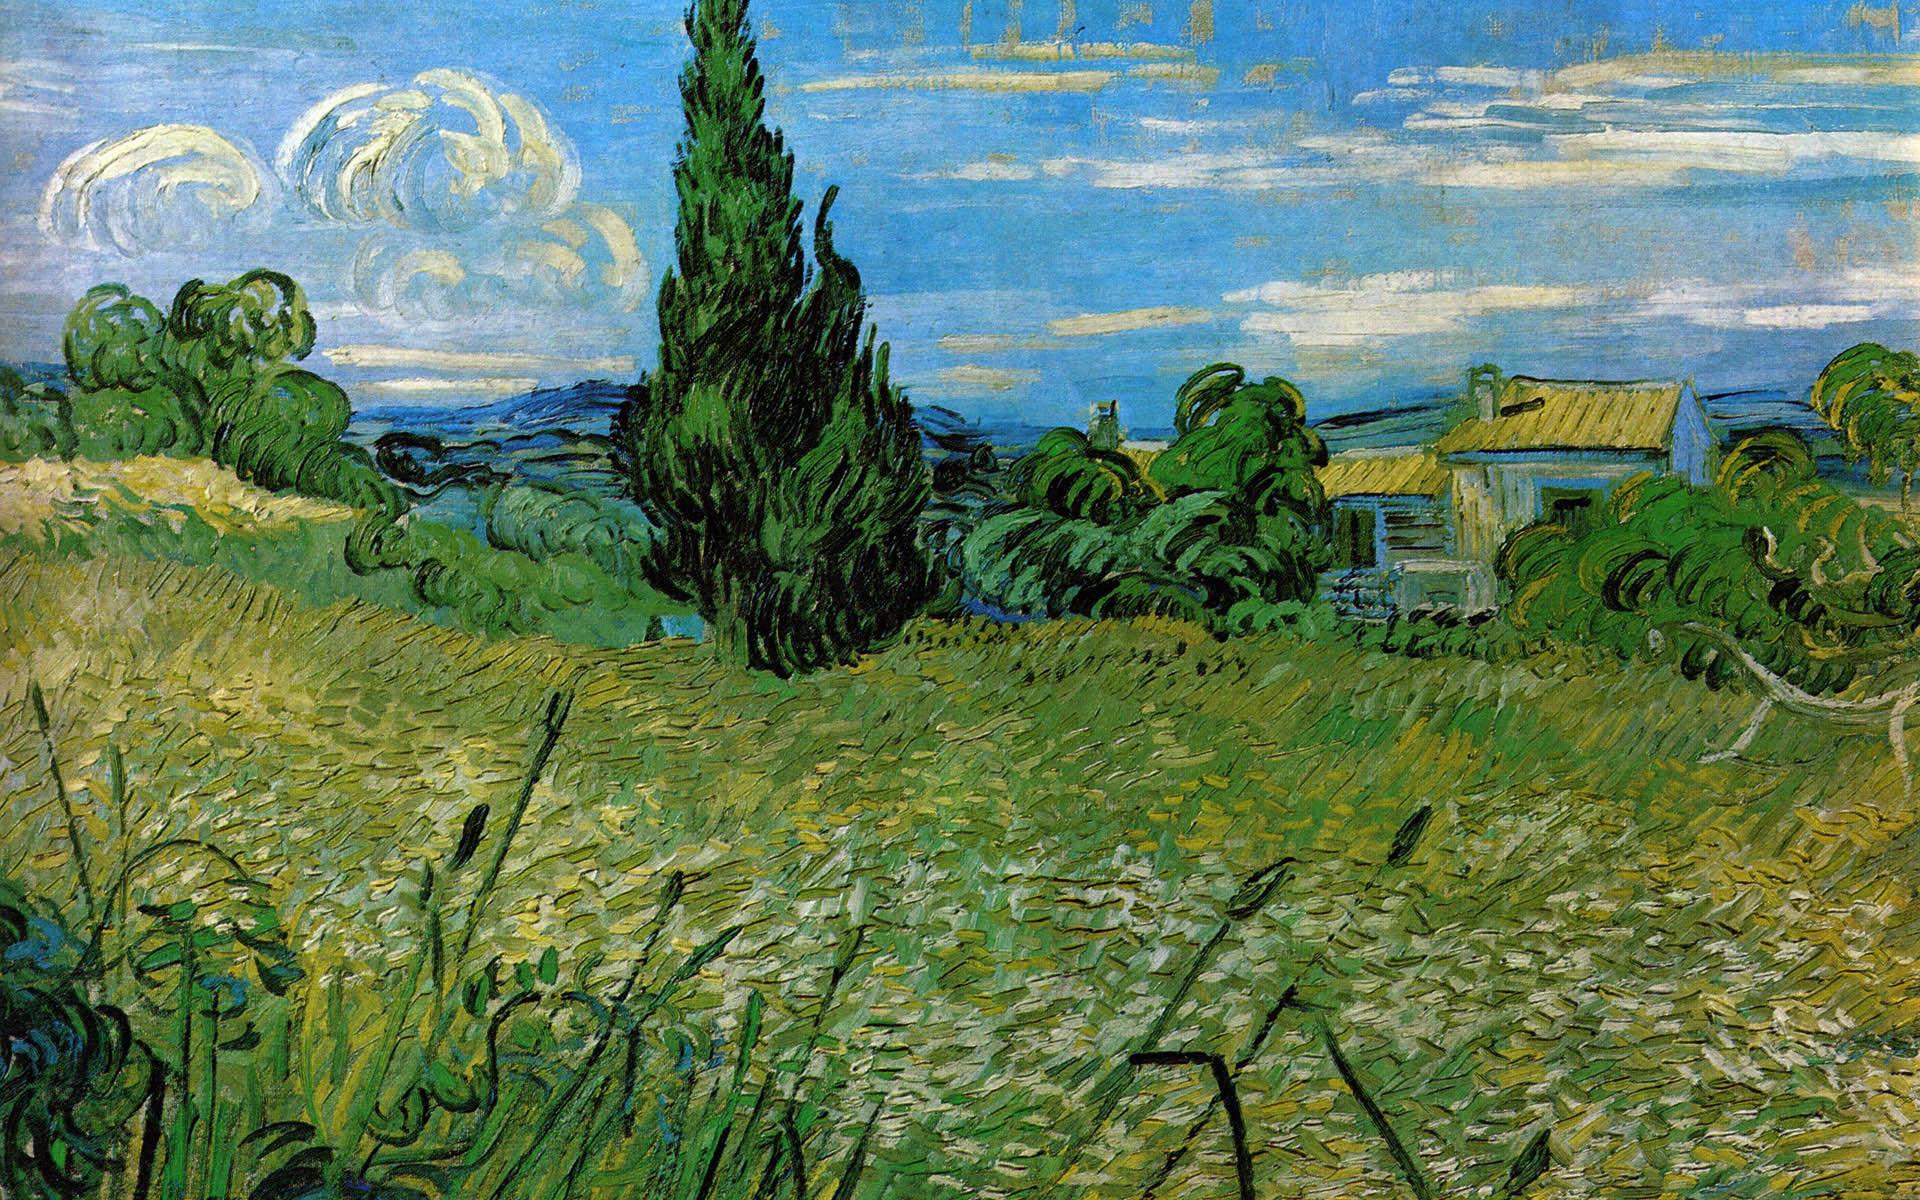 Van Gogh Starry Night Iphone Wallpaper Vincent Van Gogh Wallpapers 59 Images